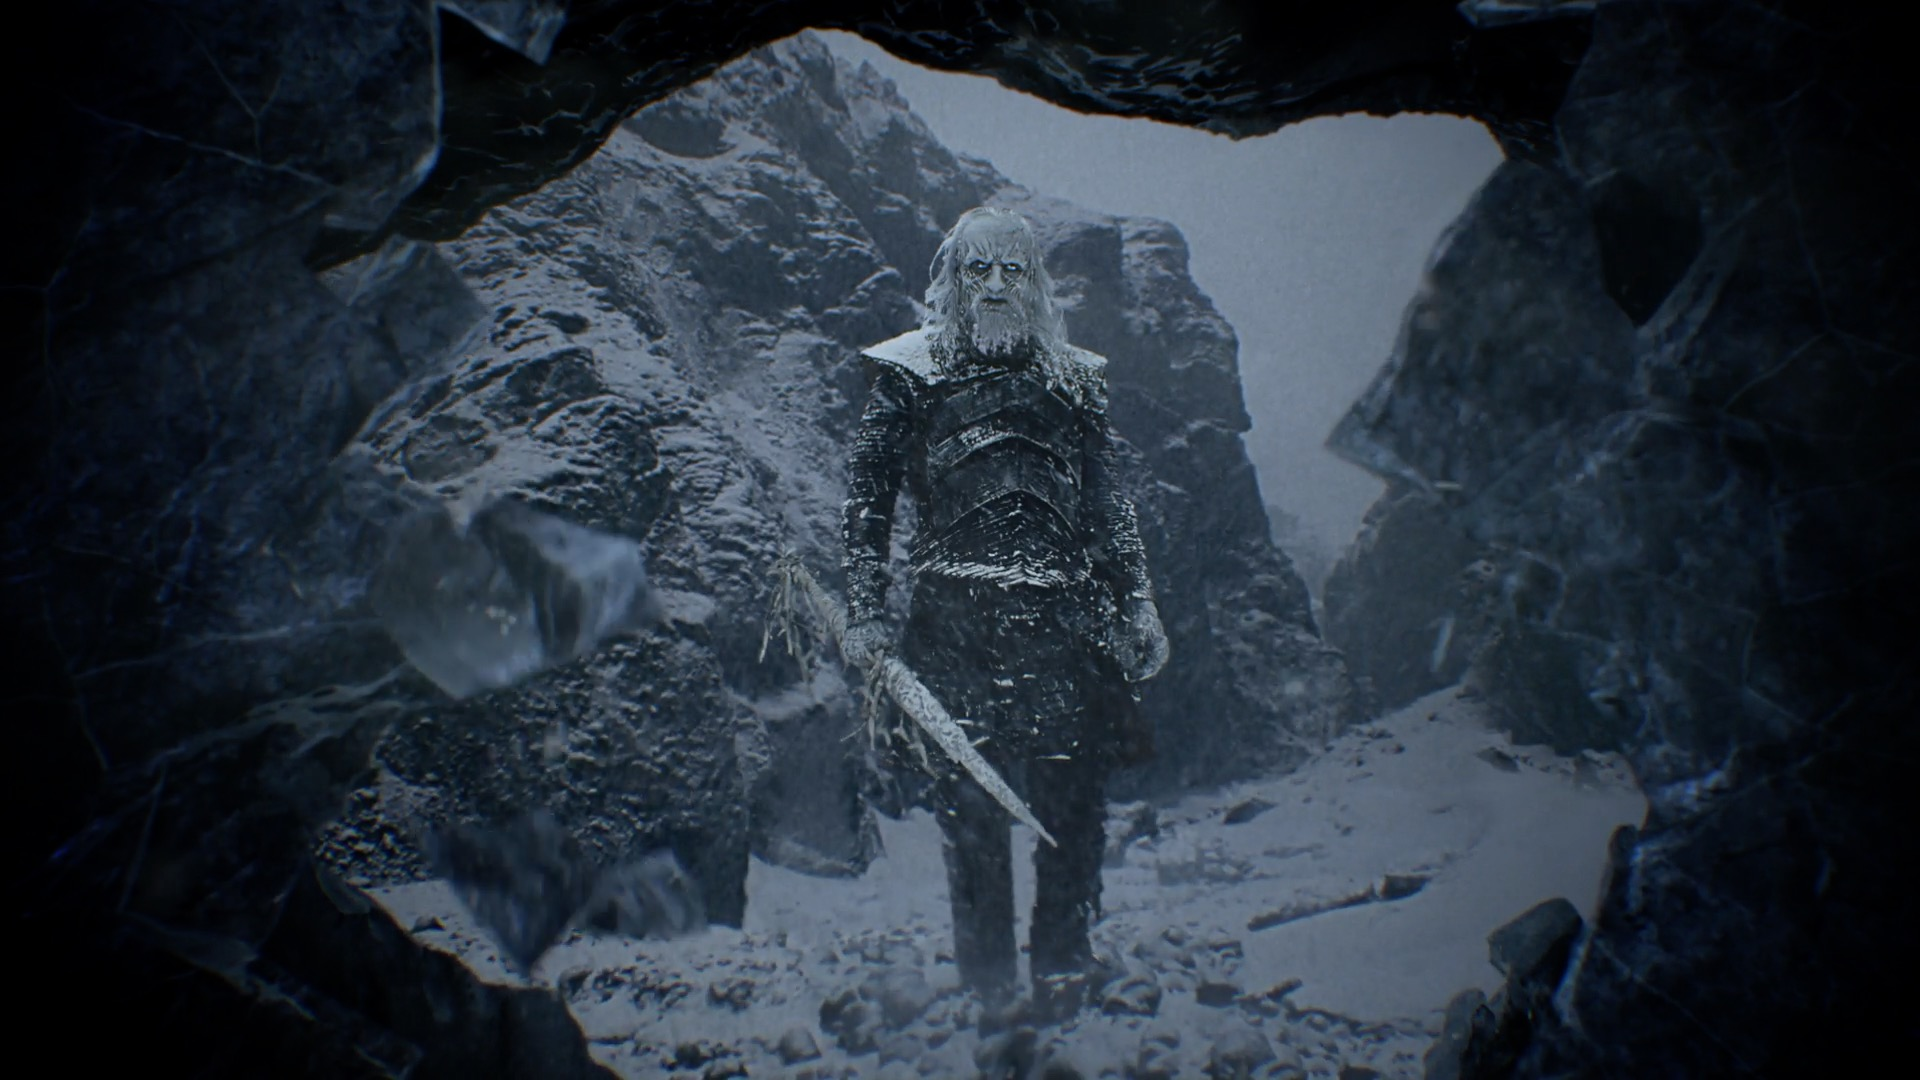 Game of Thrones: VR & Magic Leap Experiences